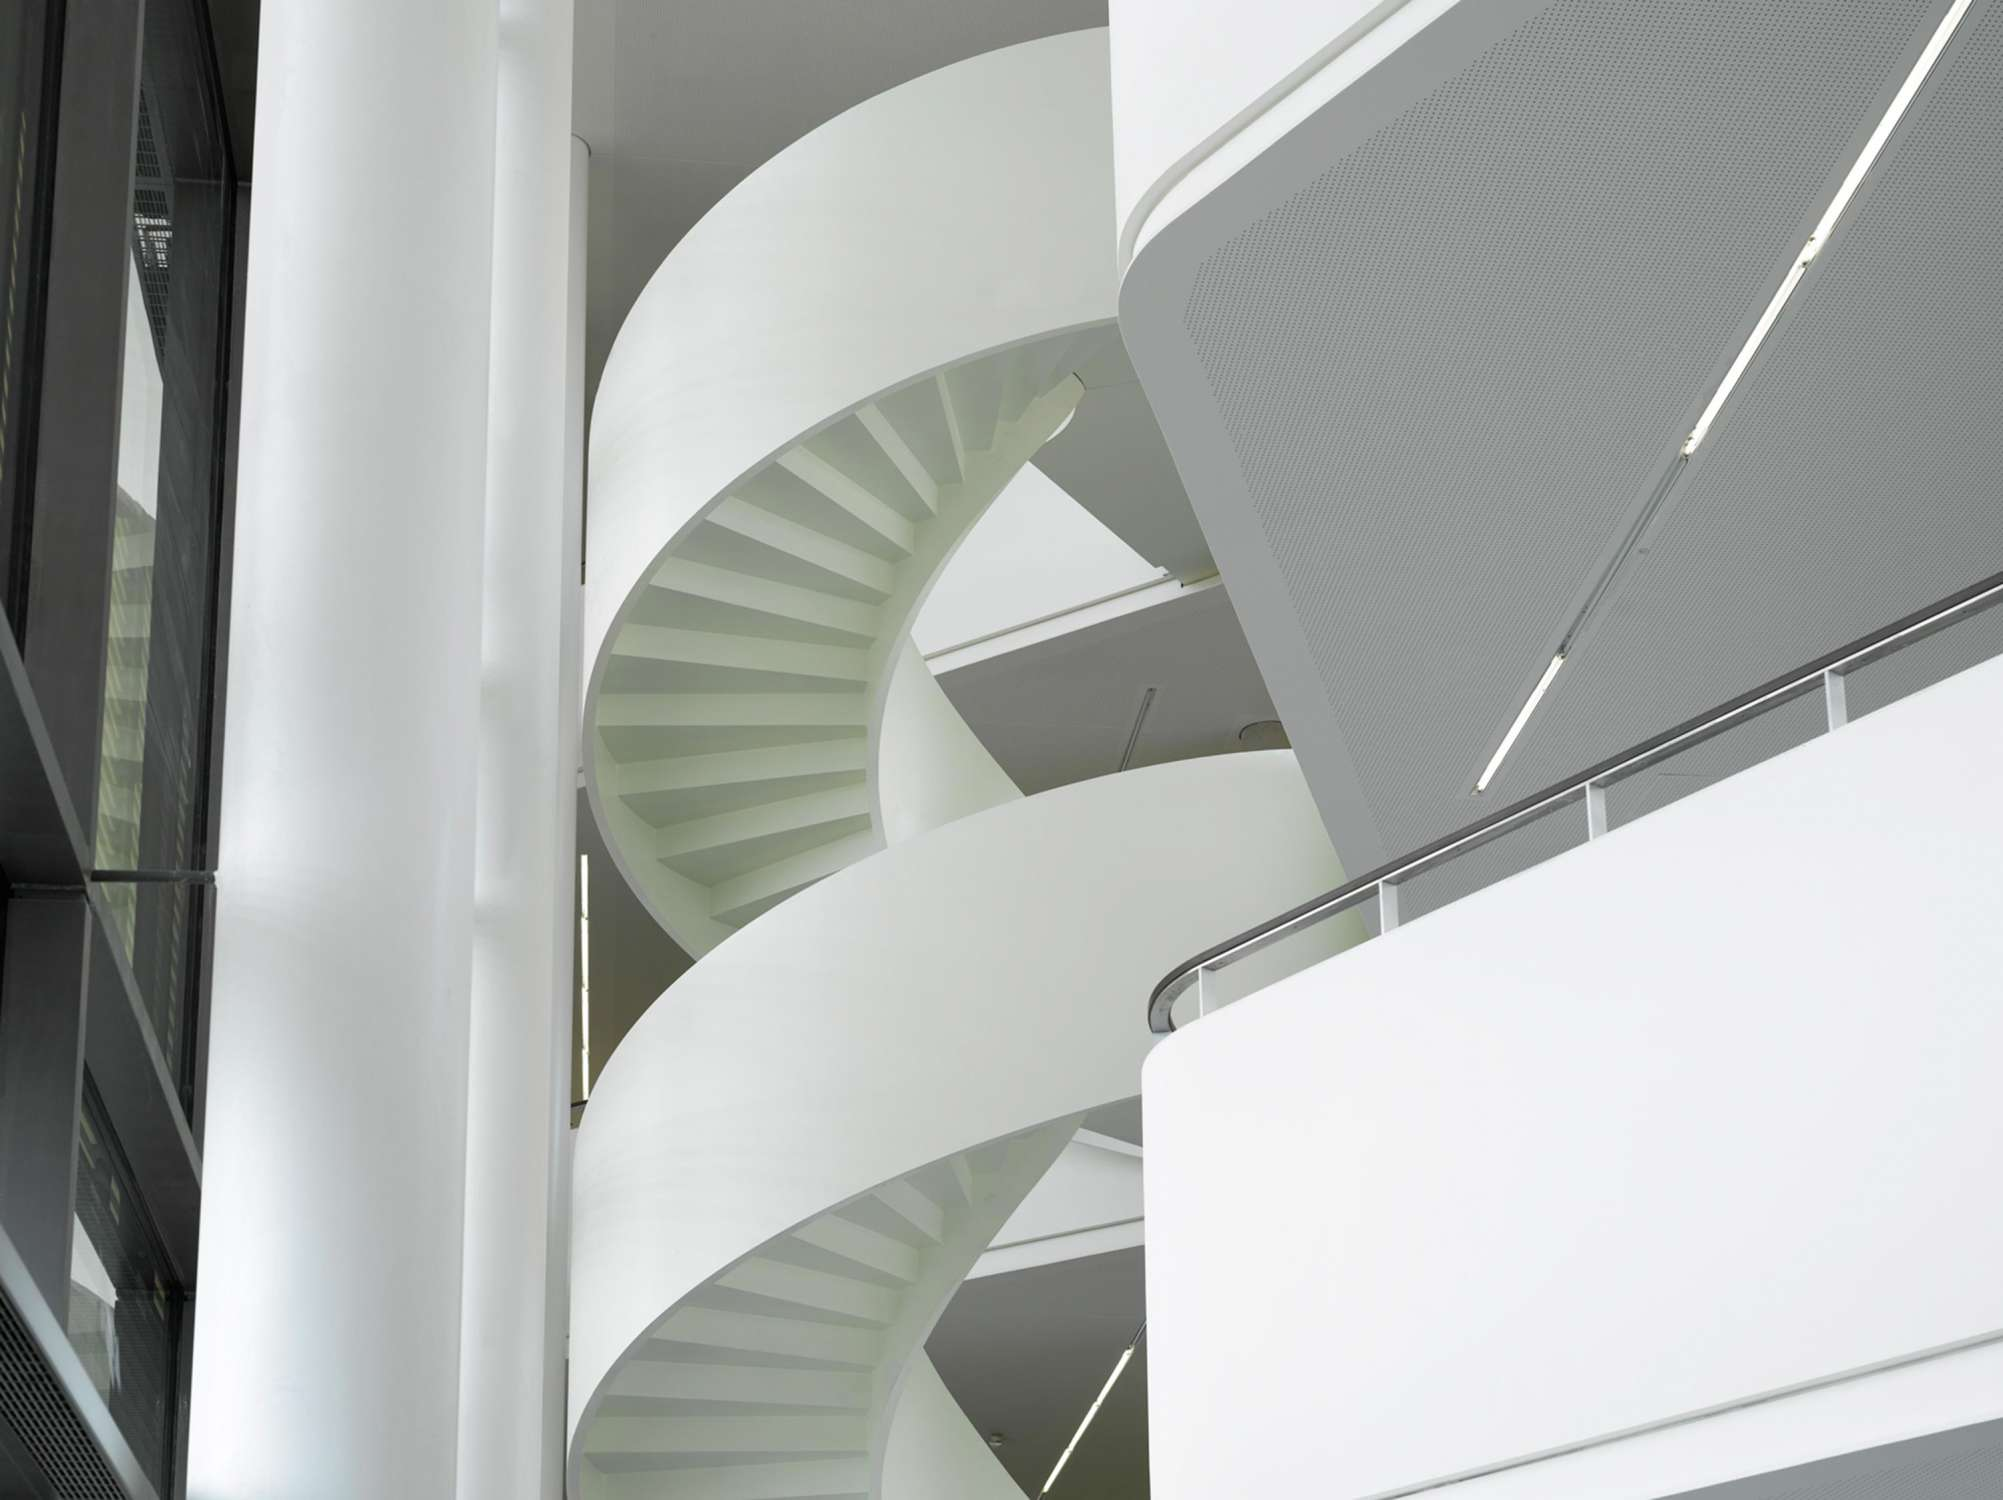 Max-Planck-Institut für Chemie (9)